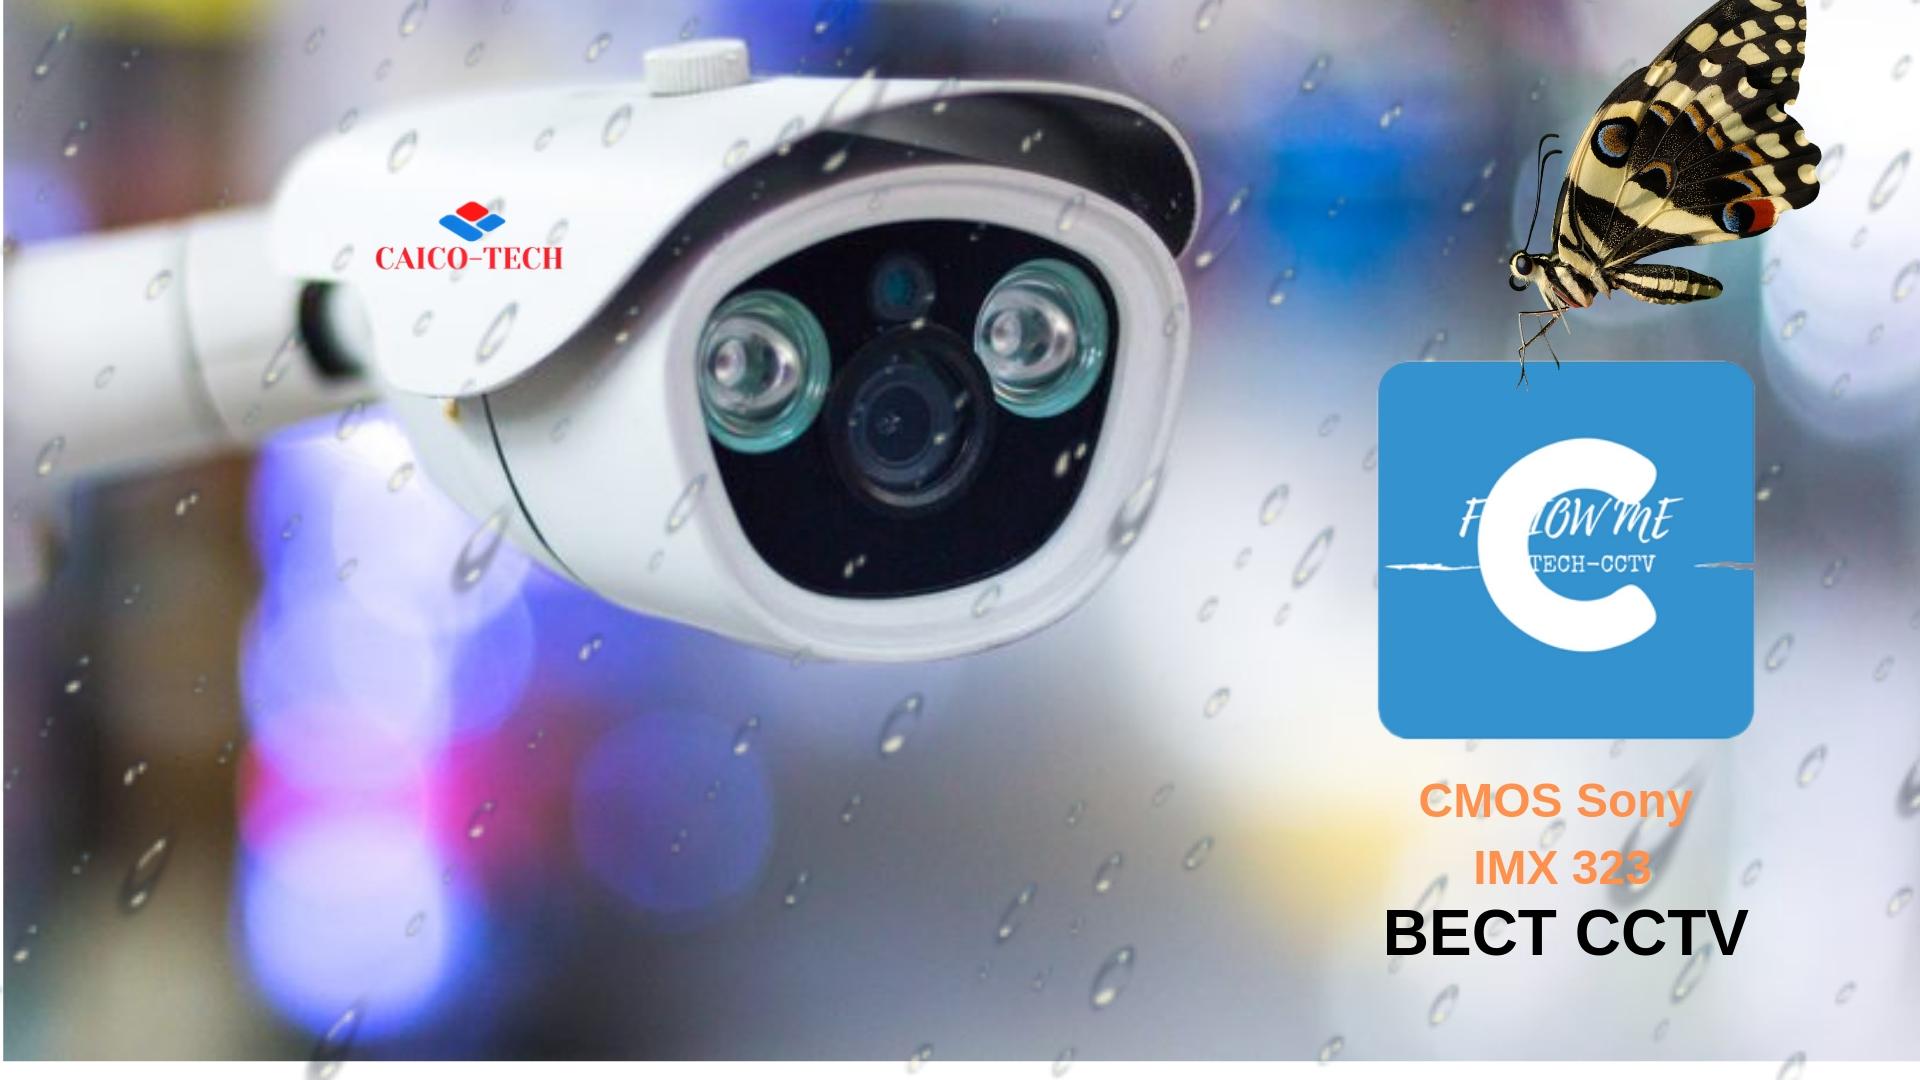 Уличная видеокамера CAICO-TECH FY- SA 322 CMOS SONY EXMOR IMX322